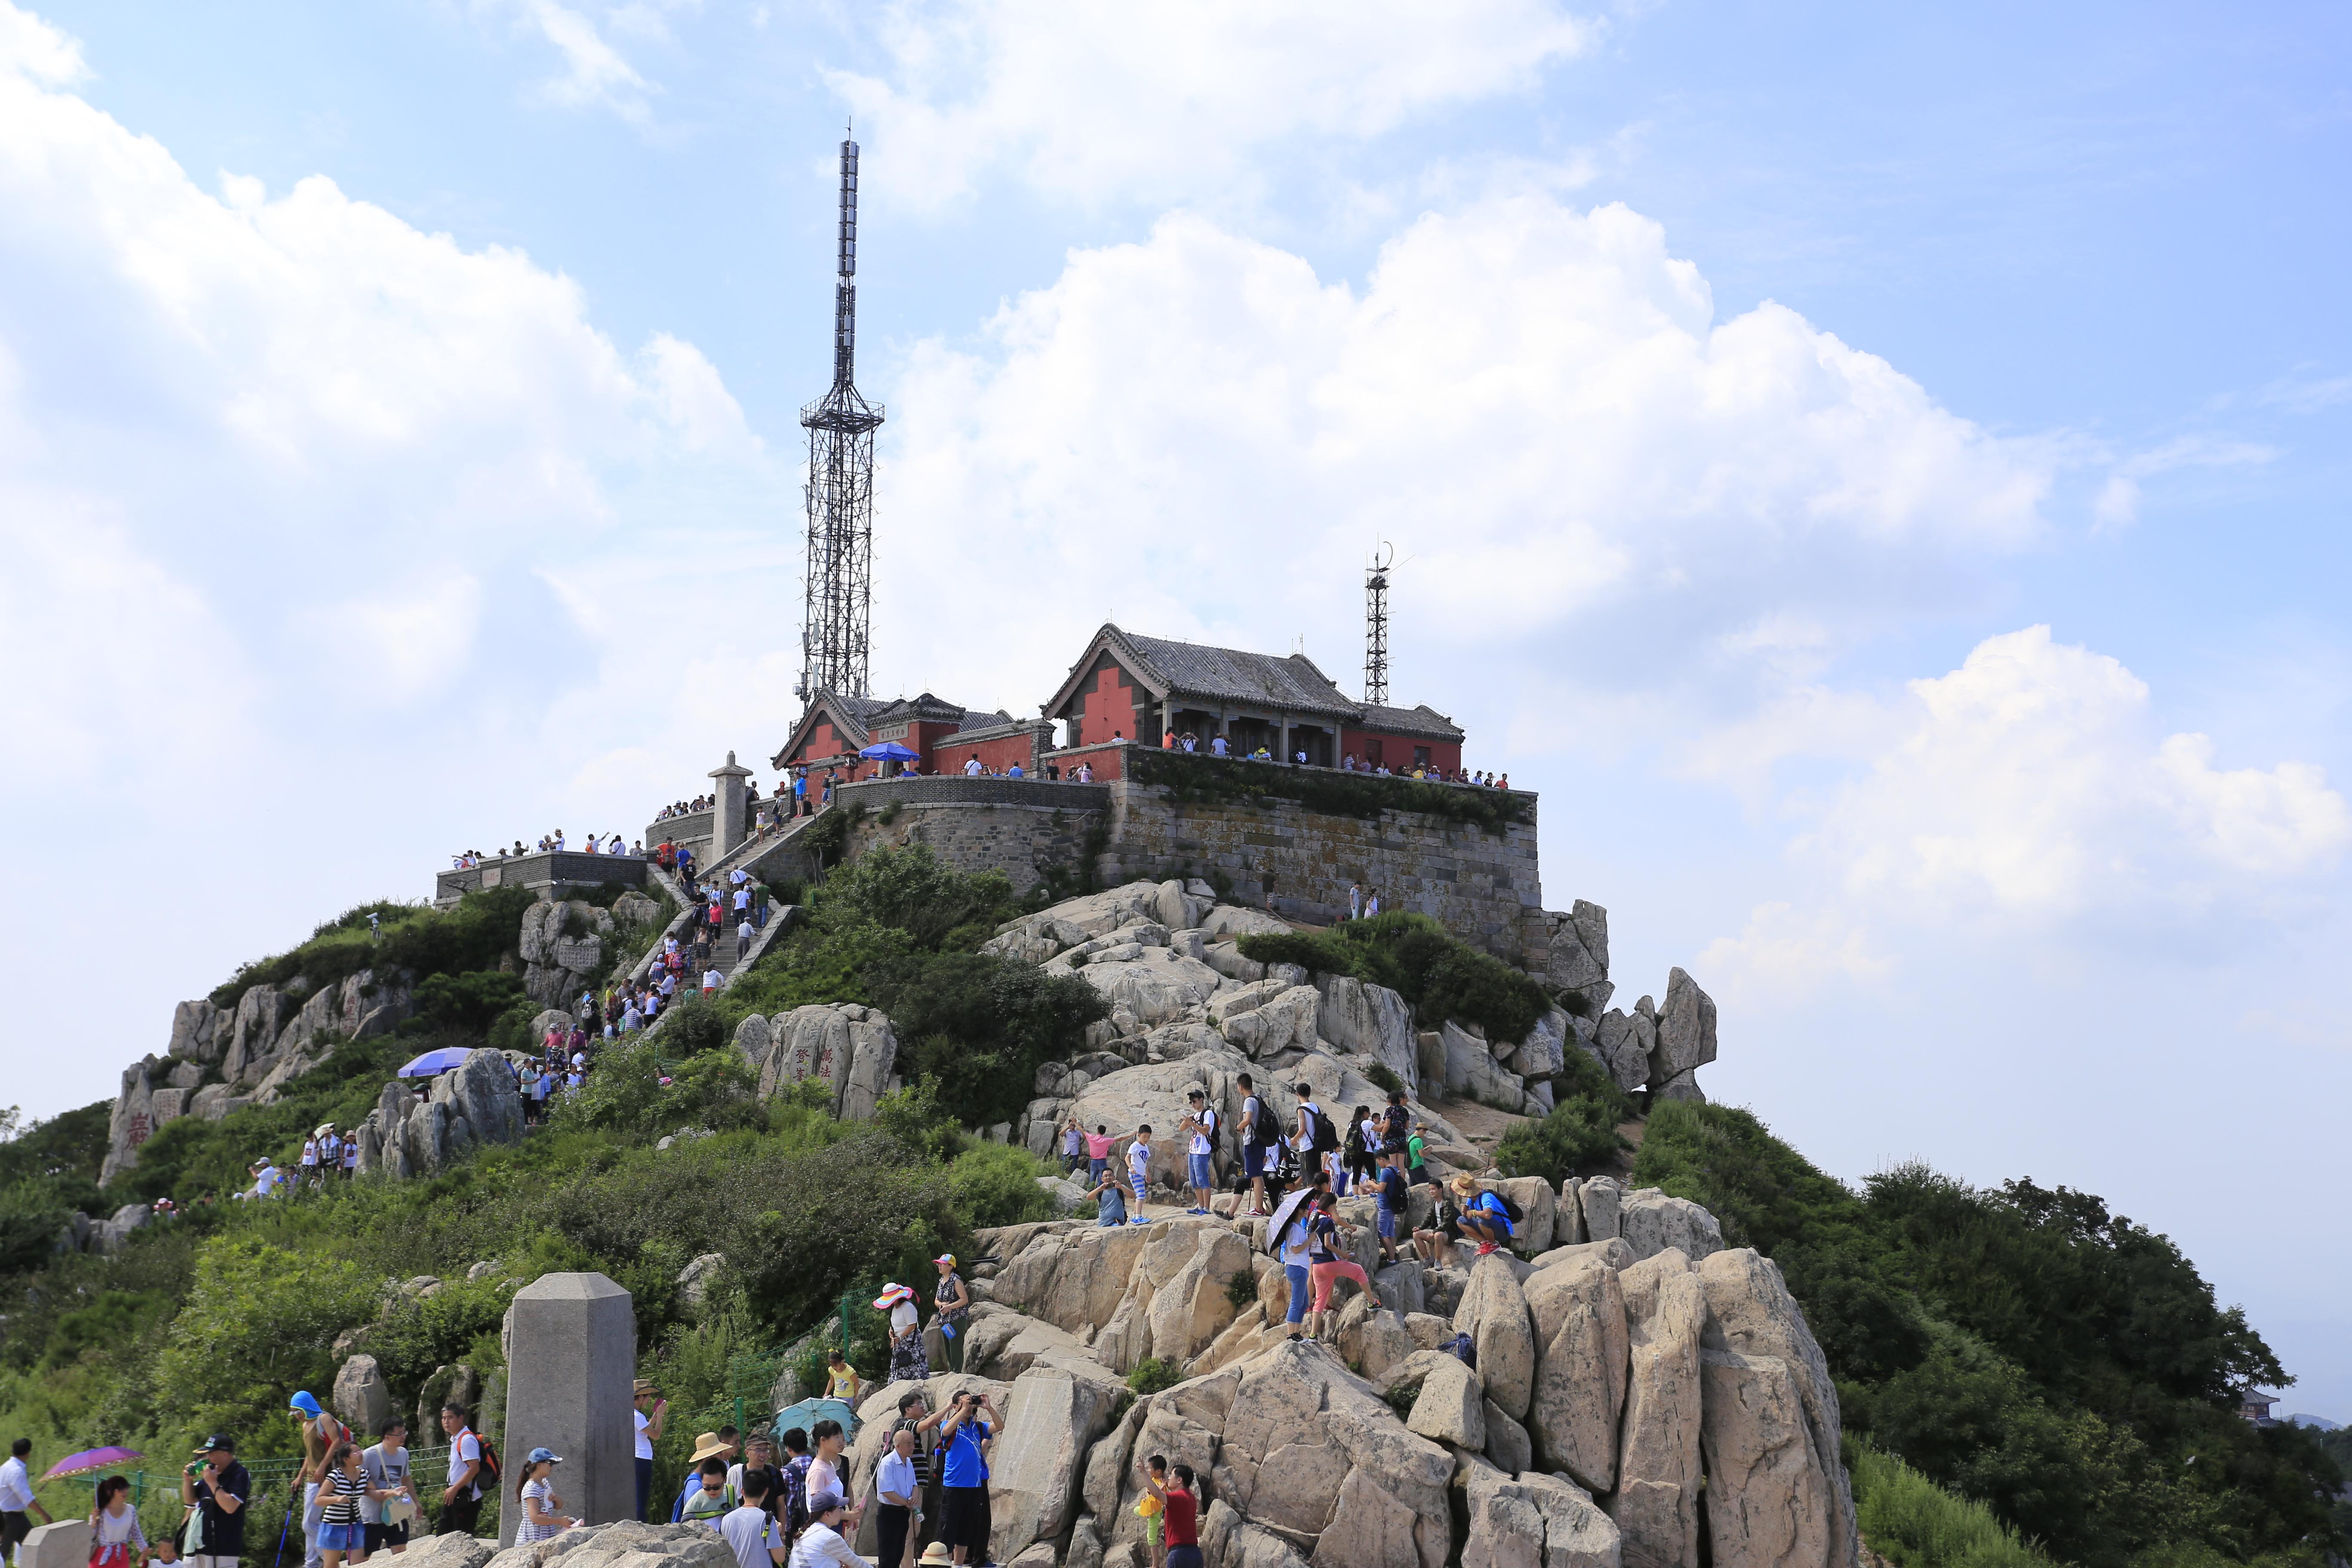 ''Jade Emperor Peak'', the summit of Mount Tai